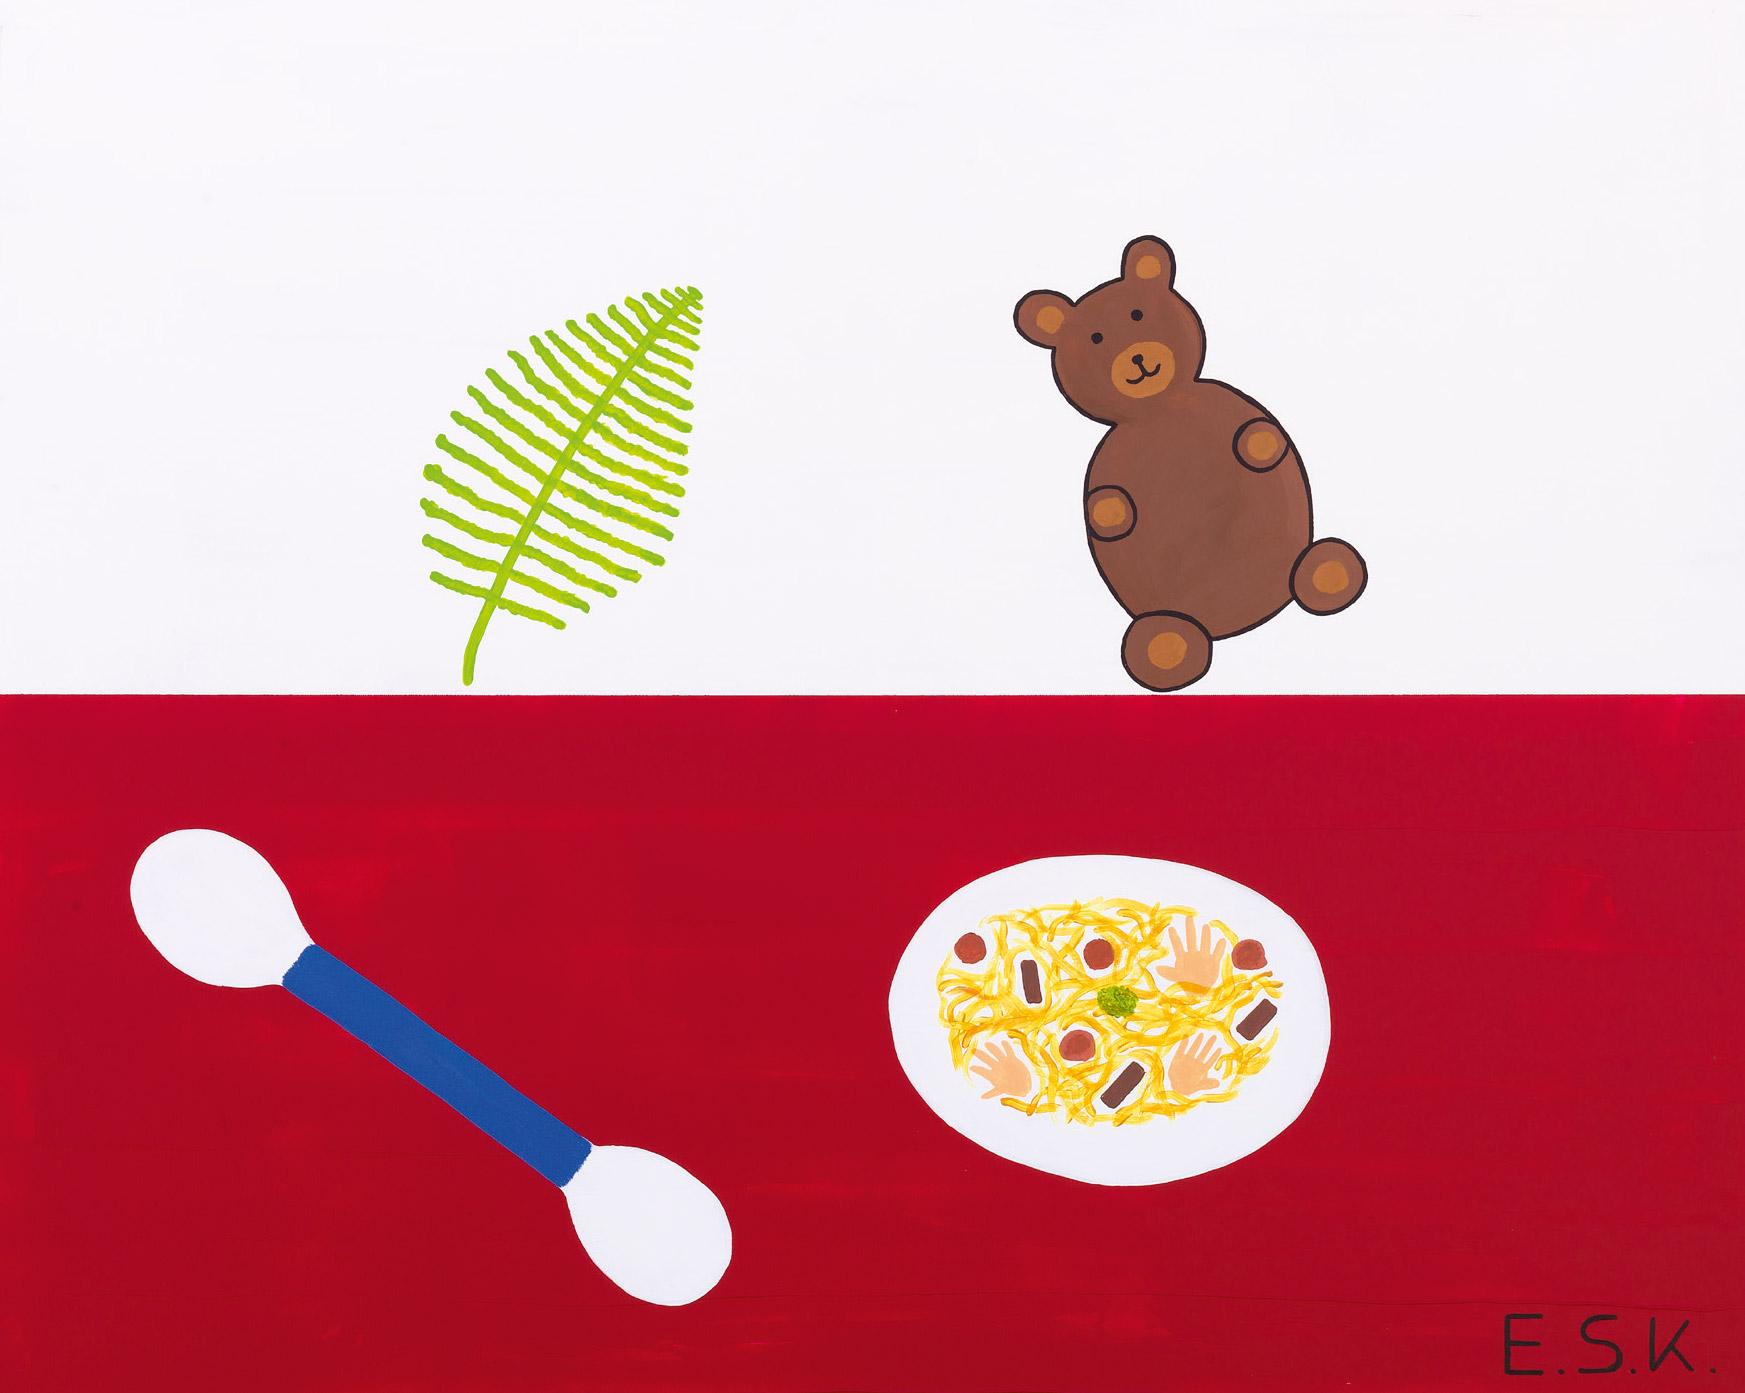 Pop Art by E.S.K. Eileen Susanne Kreipl